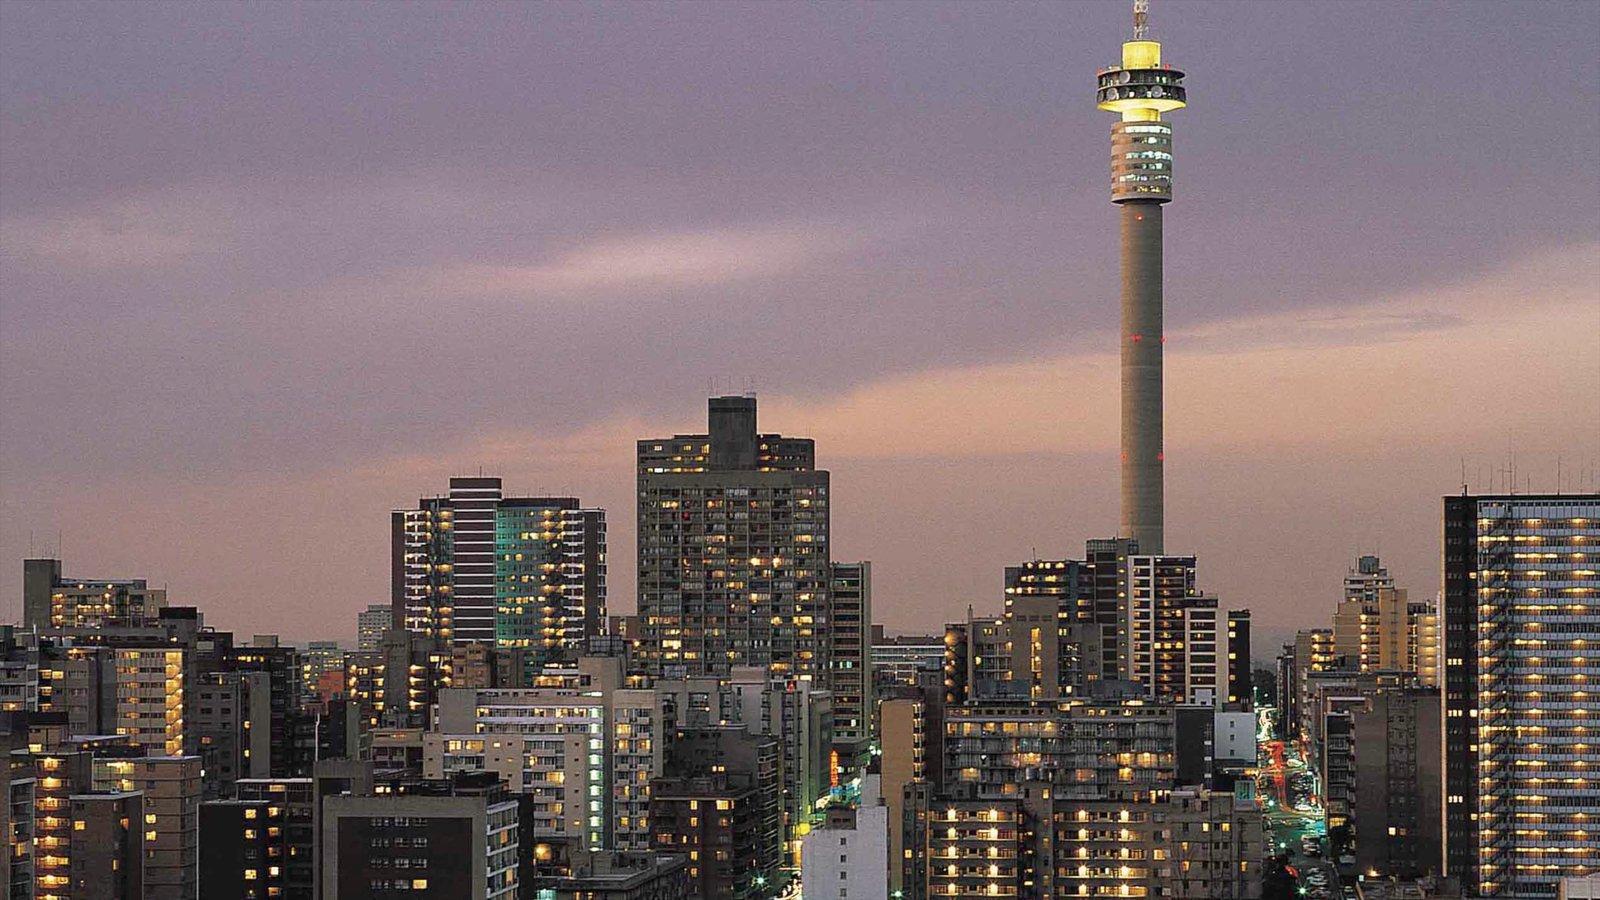 https://a.travel-assets.com/findyours-php/viewfinder/images/res60/65000/65128-Johannesburg-Gauteng-Province.jpg